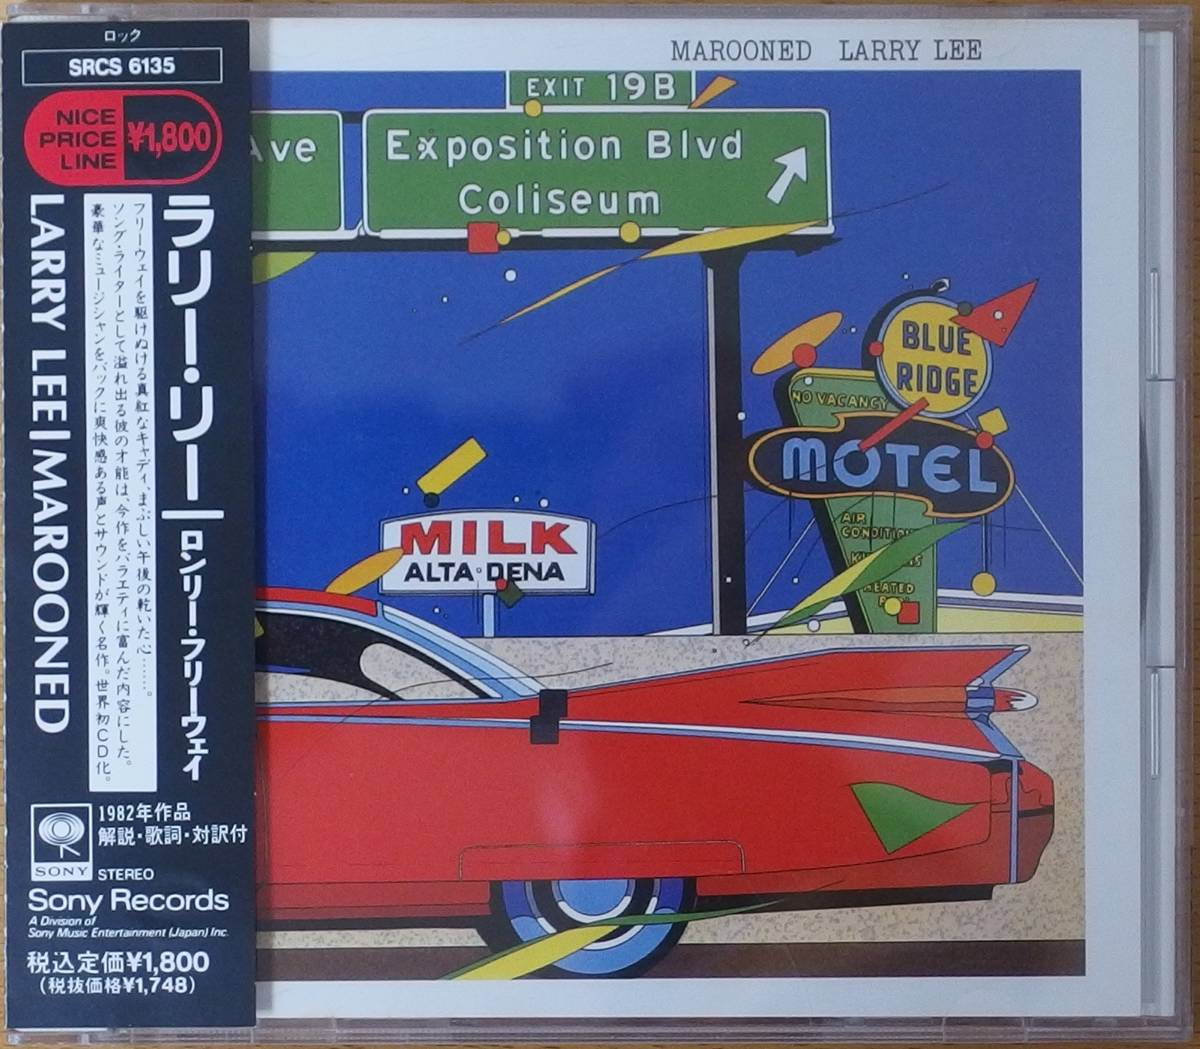 Larry Lee Marooned ラリー・リー/ロンリー・フリーウェイ 国内盤中古CD 歌詞、対訳、解説付き AOR名曲 Don't Talk 収録